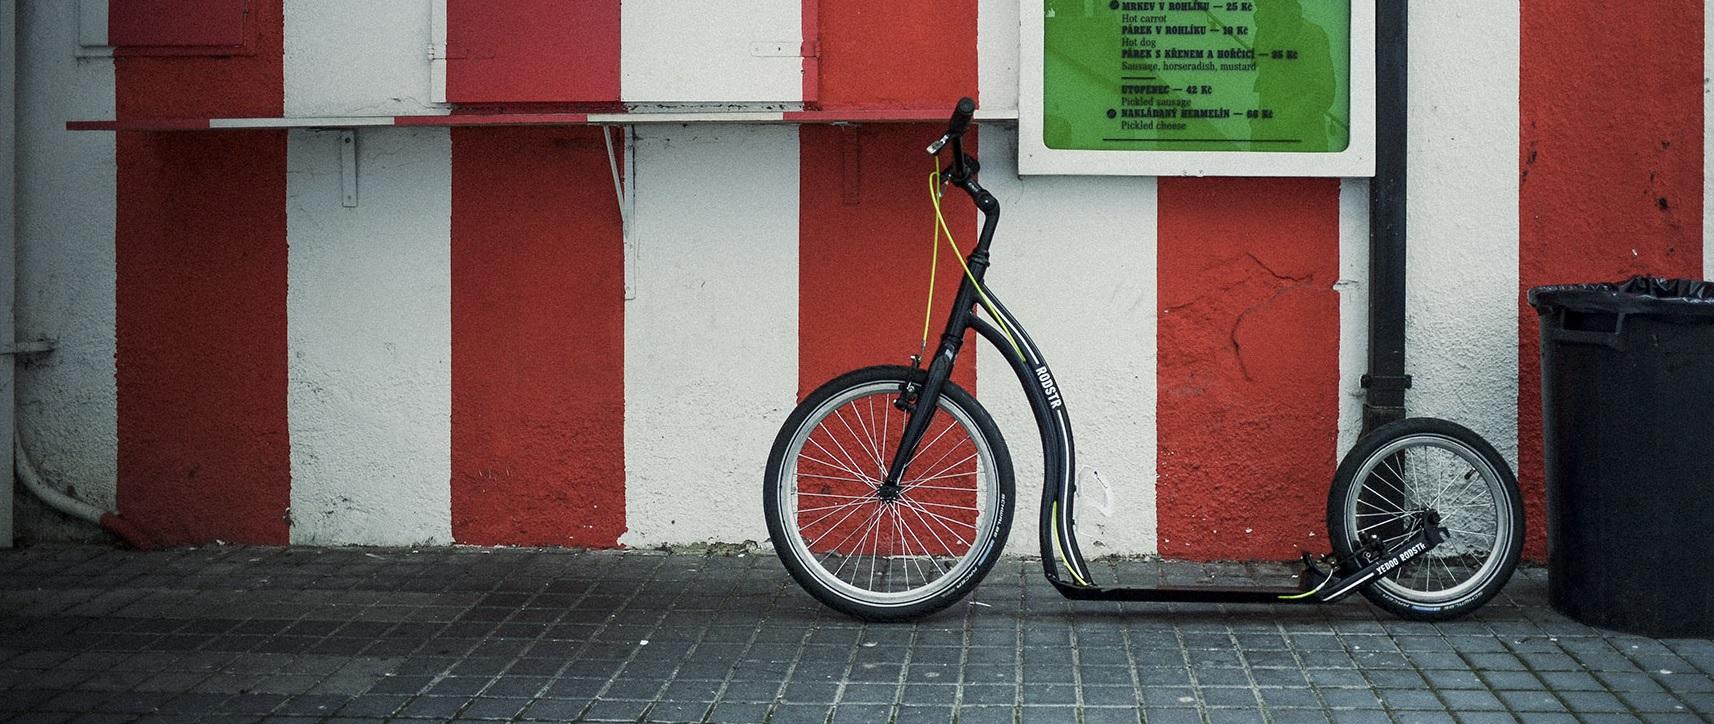 kickbike tretroller online kaufen g nstig kaufen. Black Bedroom Furniture Sets. Home Design Ideas